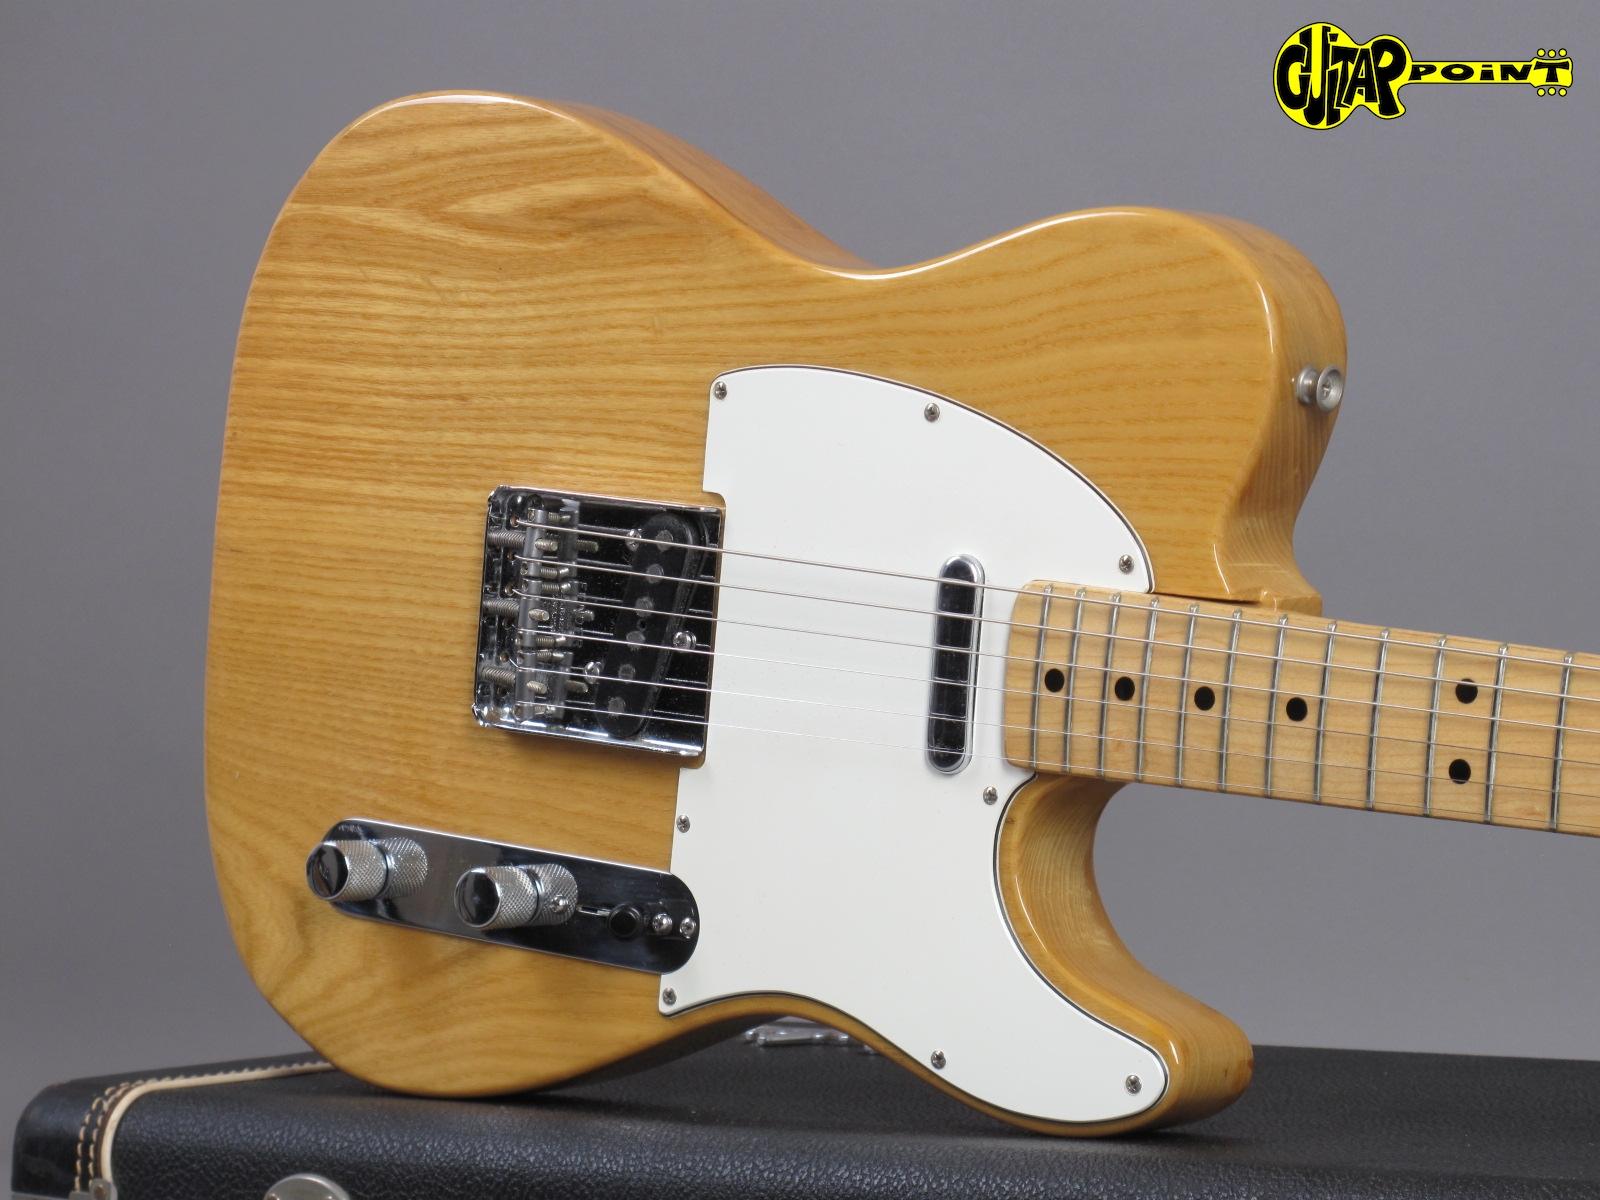 https://guitarpoint.de/app/uploads/products/1972-fender-telecaster-natural-clean/Fender72TeleNT369757_19.jpg